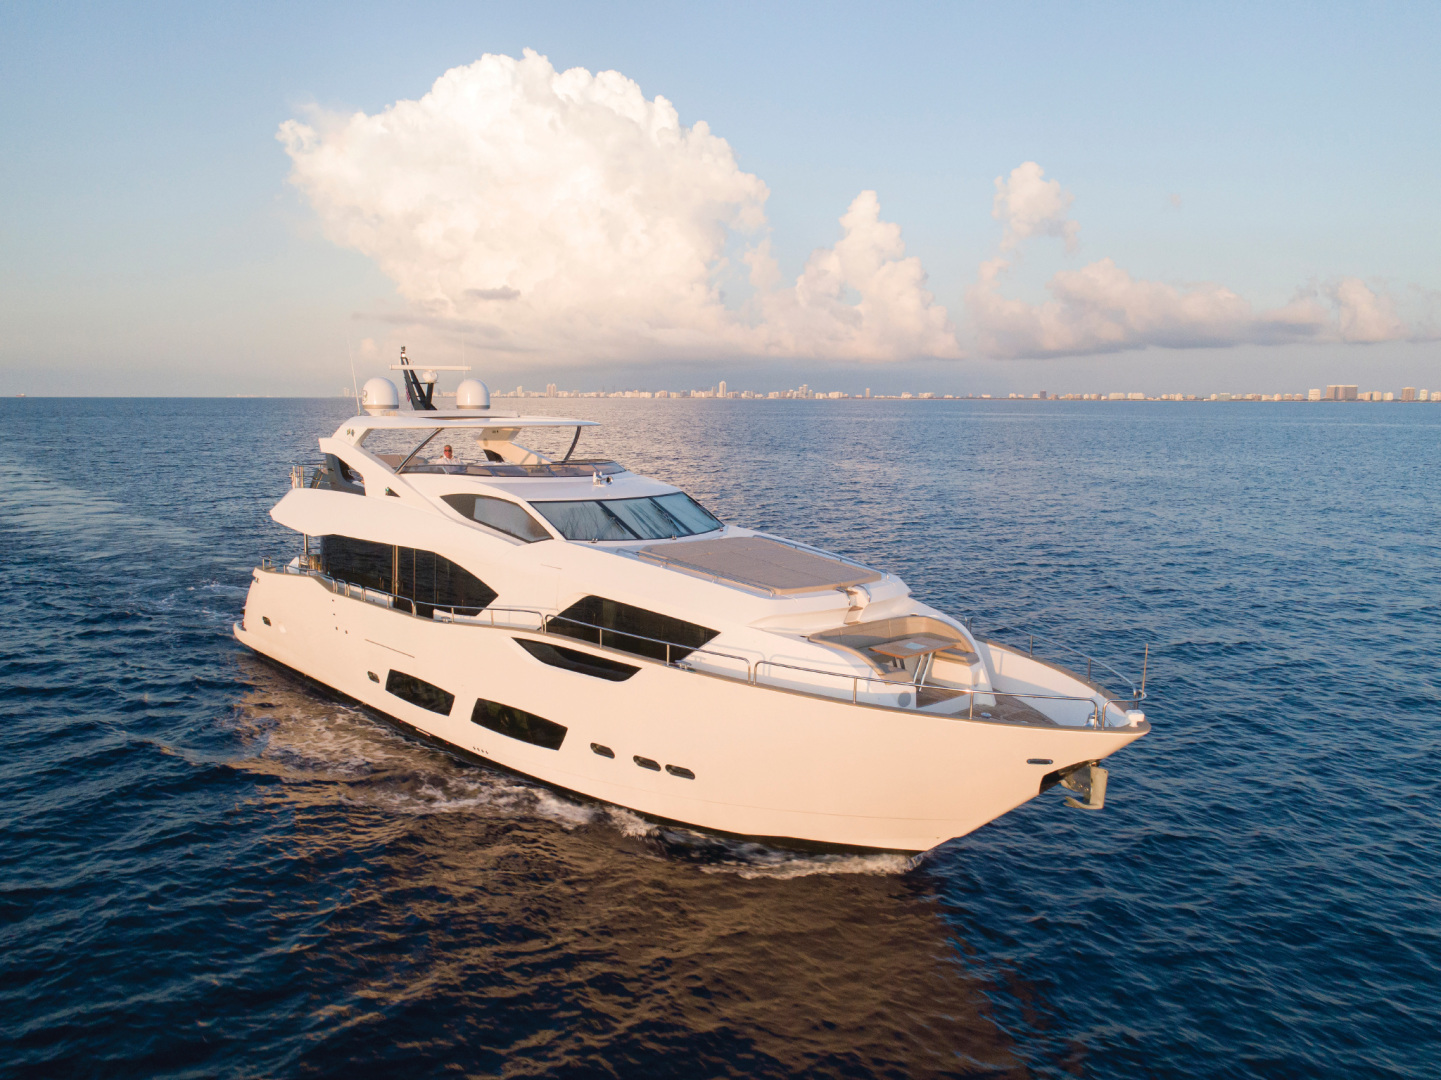 Sunseeker-95 Yacht 2017-Perseverance 3 Ft Lauderdale-Florida-United States-1400064   Thumbnail